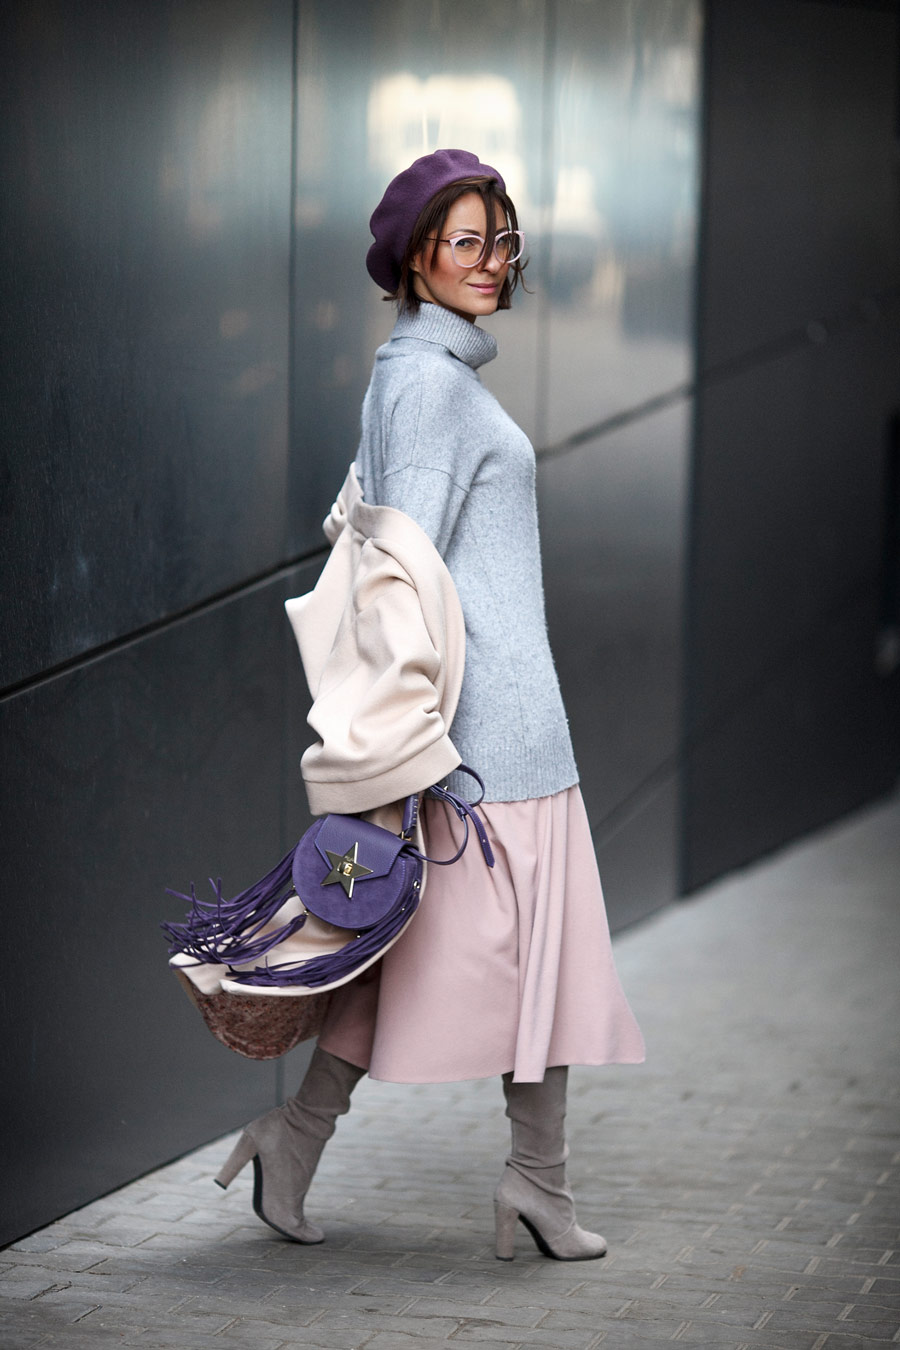 salar bags on streets